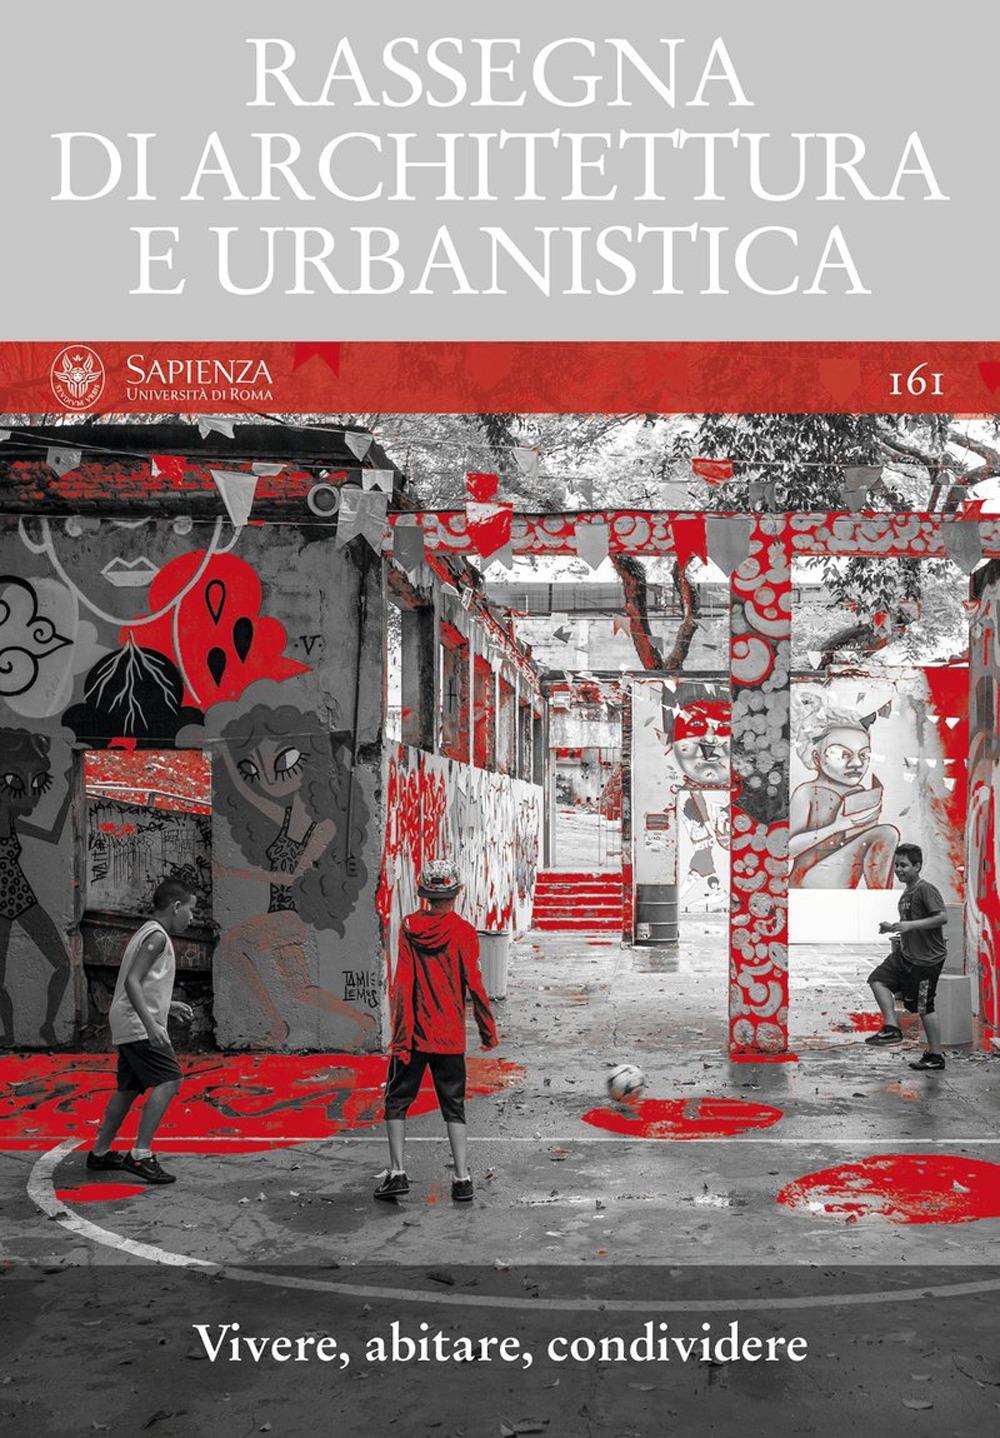 RASSEGNA DI ARCHITETTURA E URBANISTICA - Argenti M. (cur.); Blas Sergio Martín (cur.) - 9788822905857